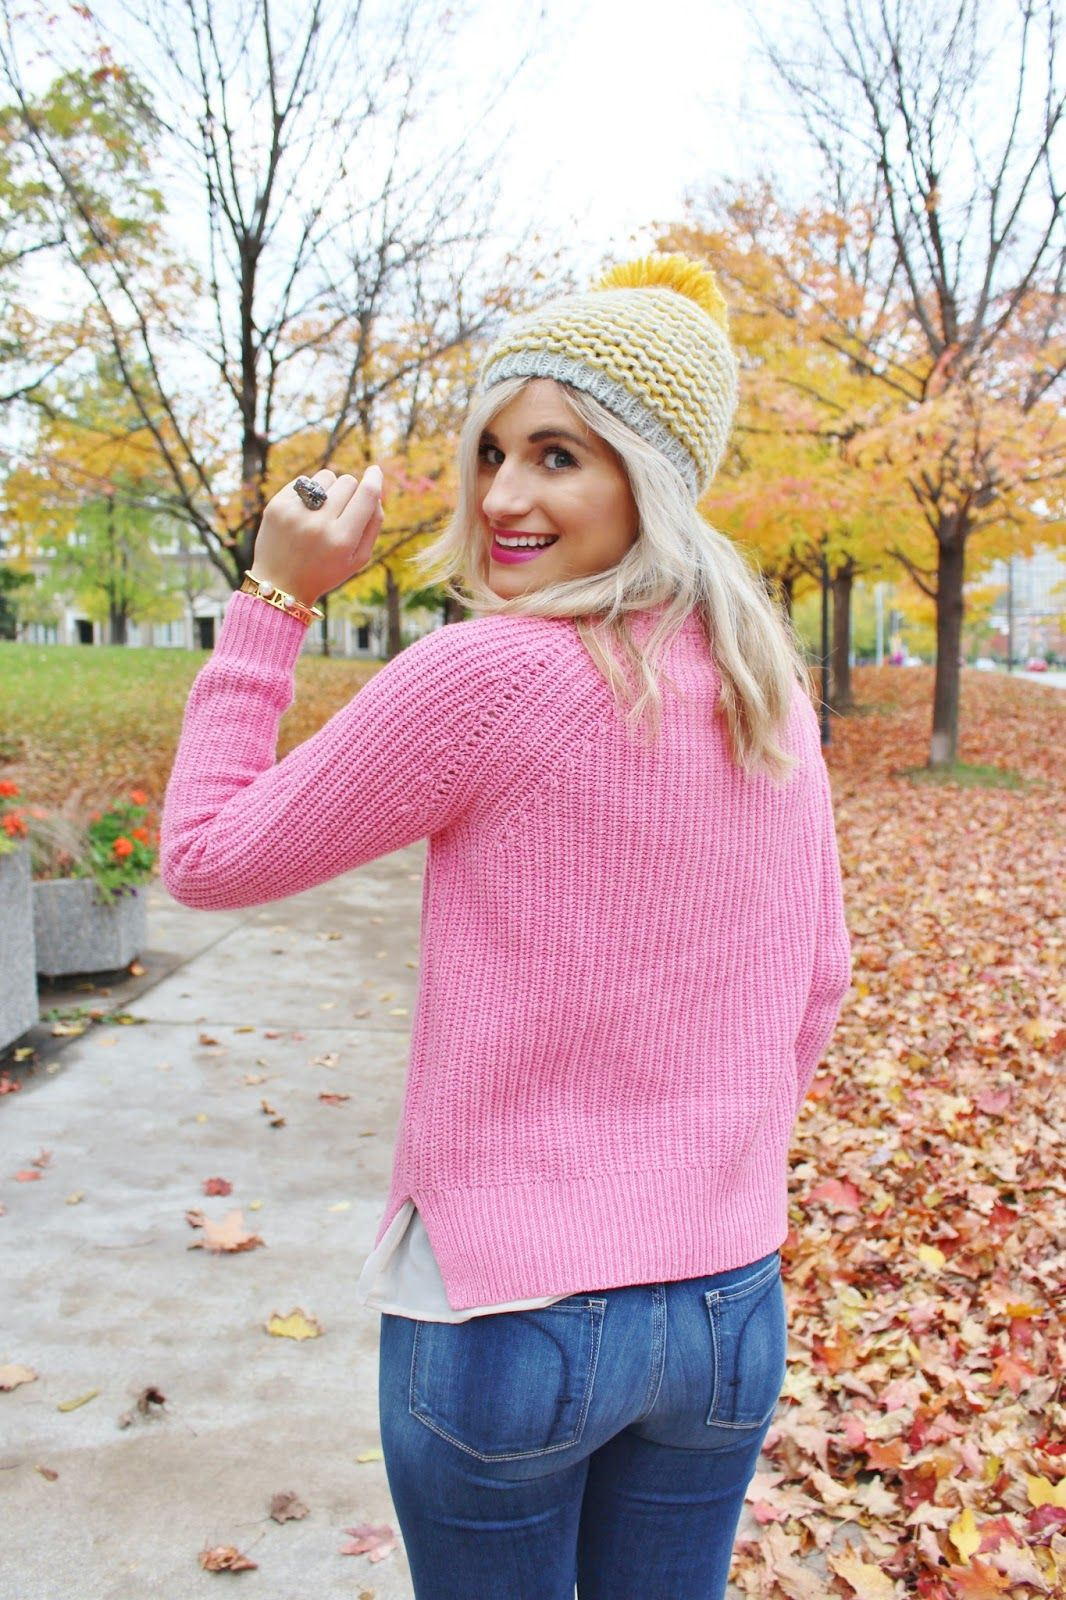 Bijuleni - Fidelity Denim skinny jeans, pink J.crew sweater, plaid blanket scarf, keds sneakers and leopard clutch ootd